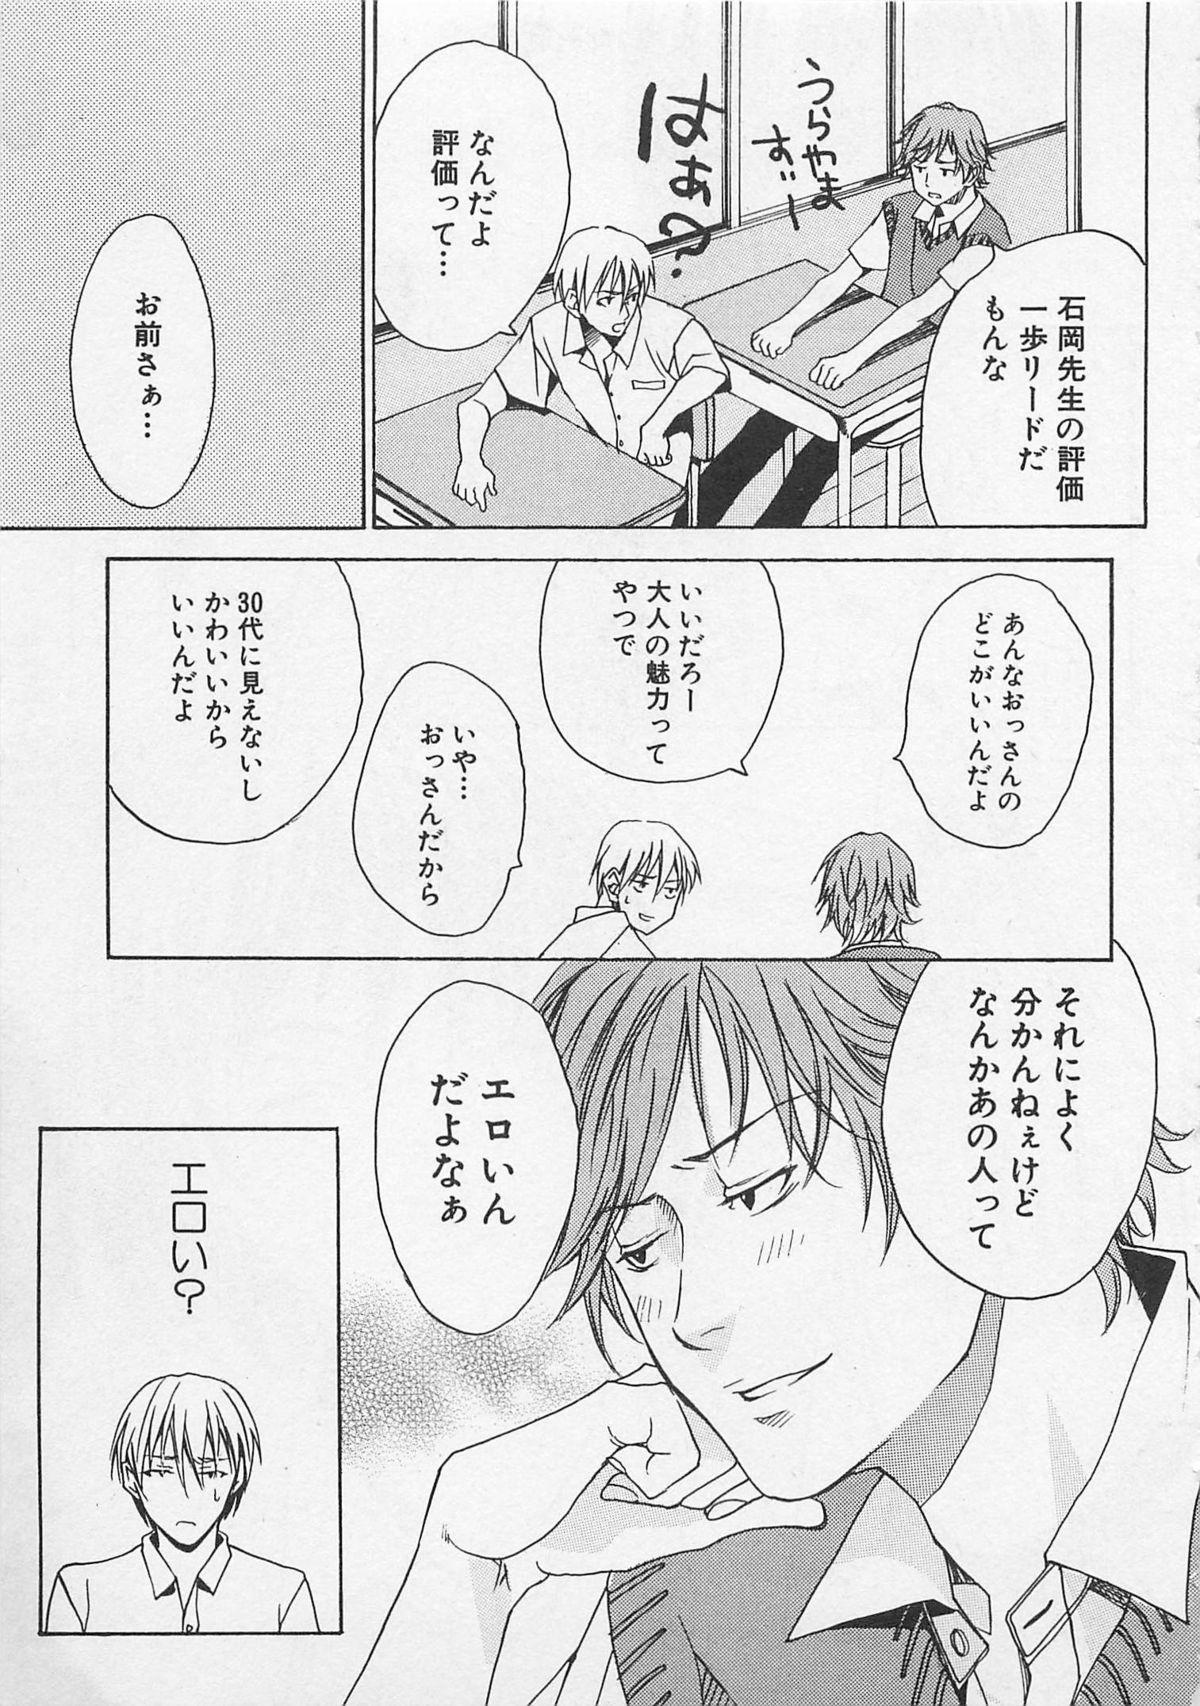 Zenkai Action 38